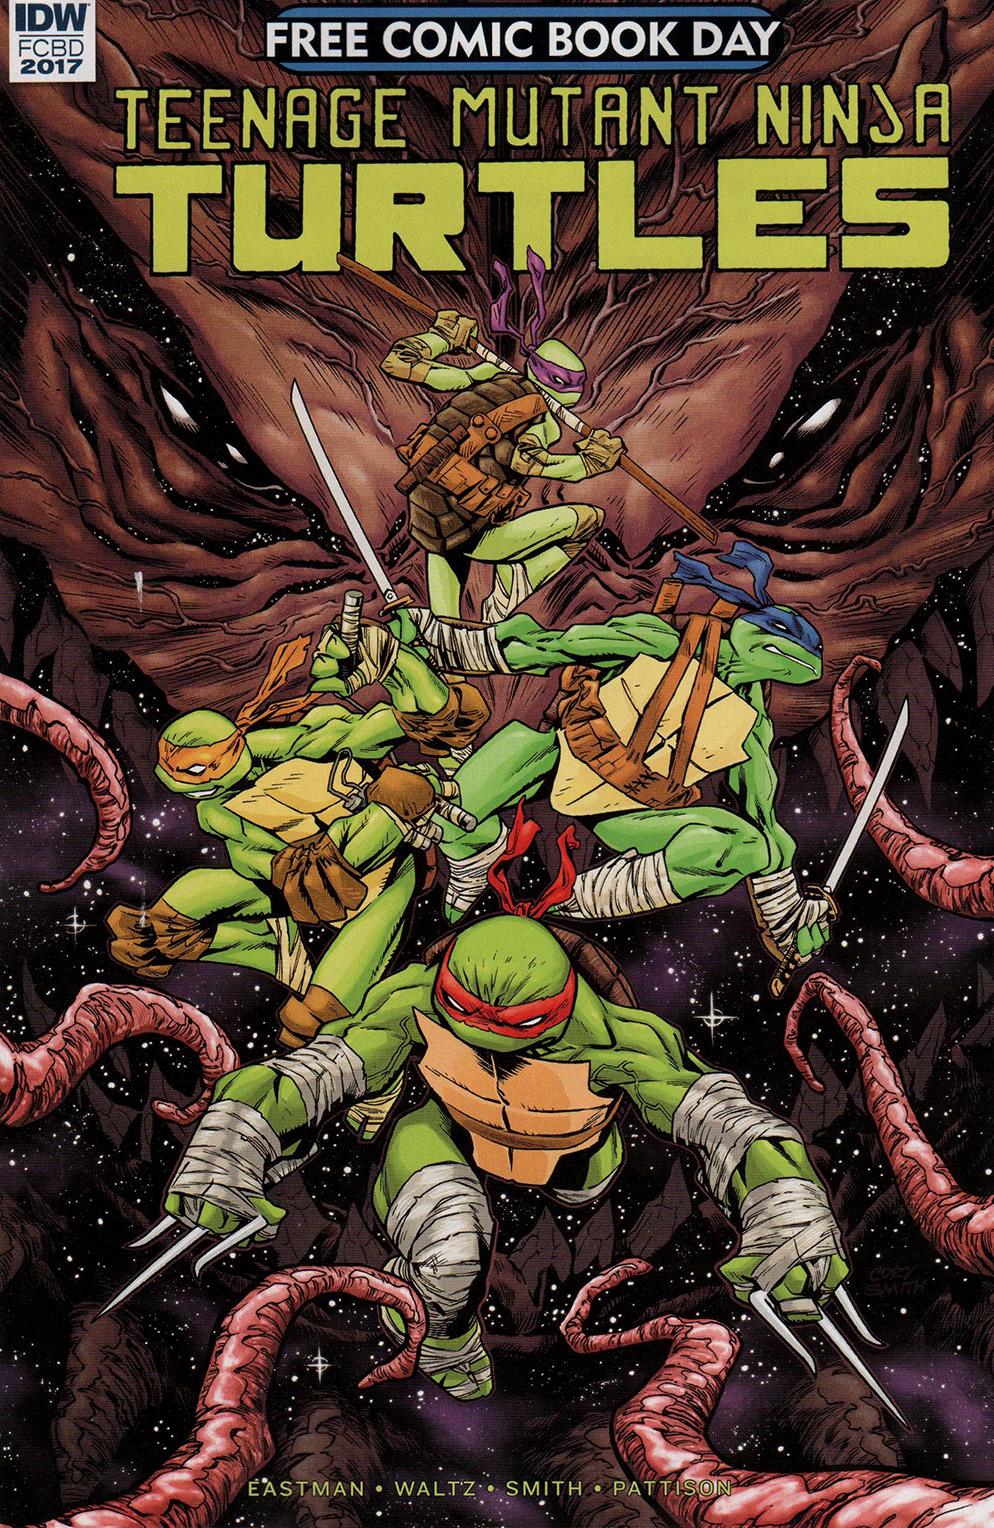 Read online Free Comic Book Day 2017 comic -  Issue # Teenage Mutant Ninja Turtles - 1